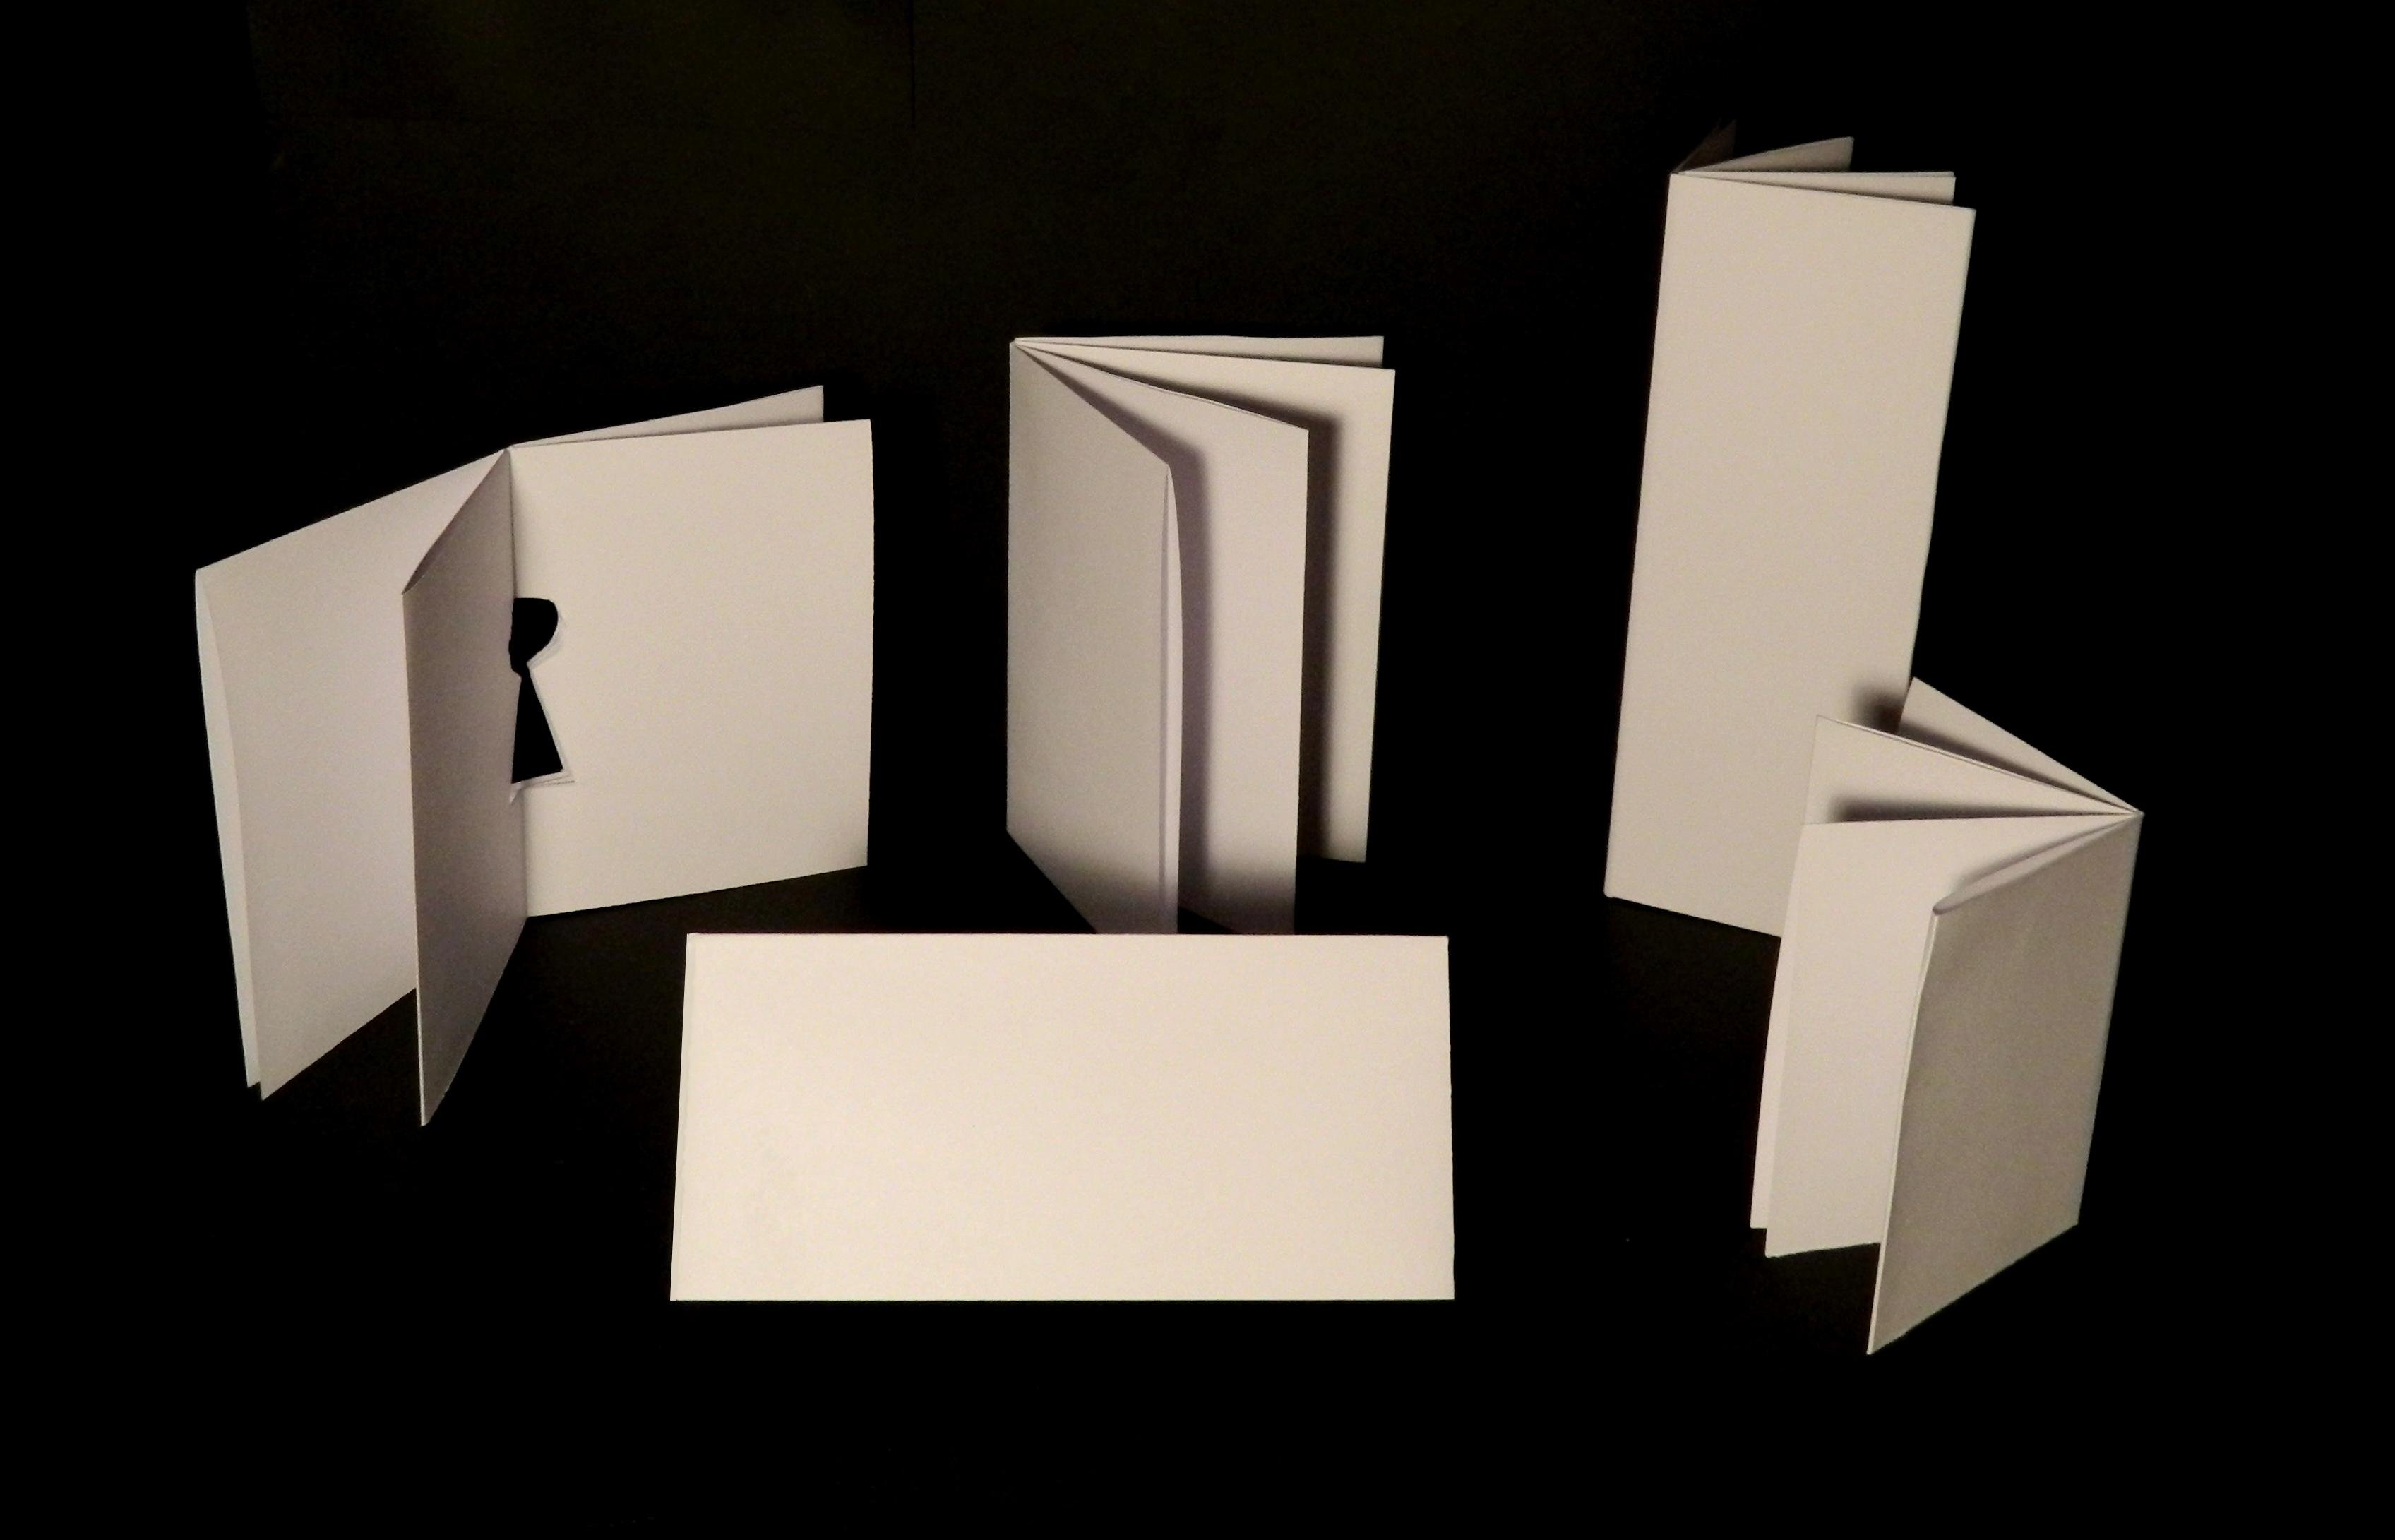 Distintos formatos a partir de un DIN A4 plegado